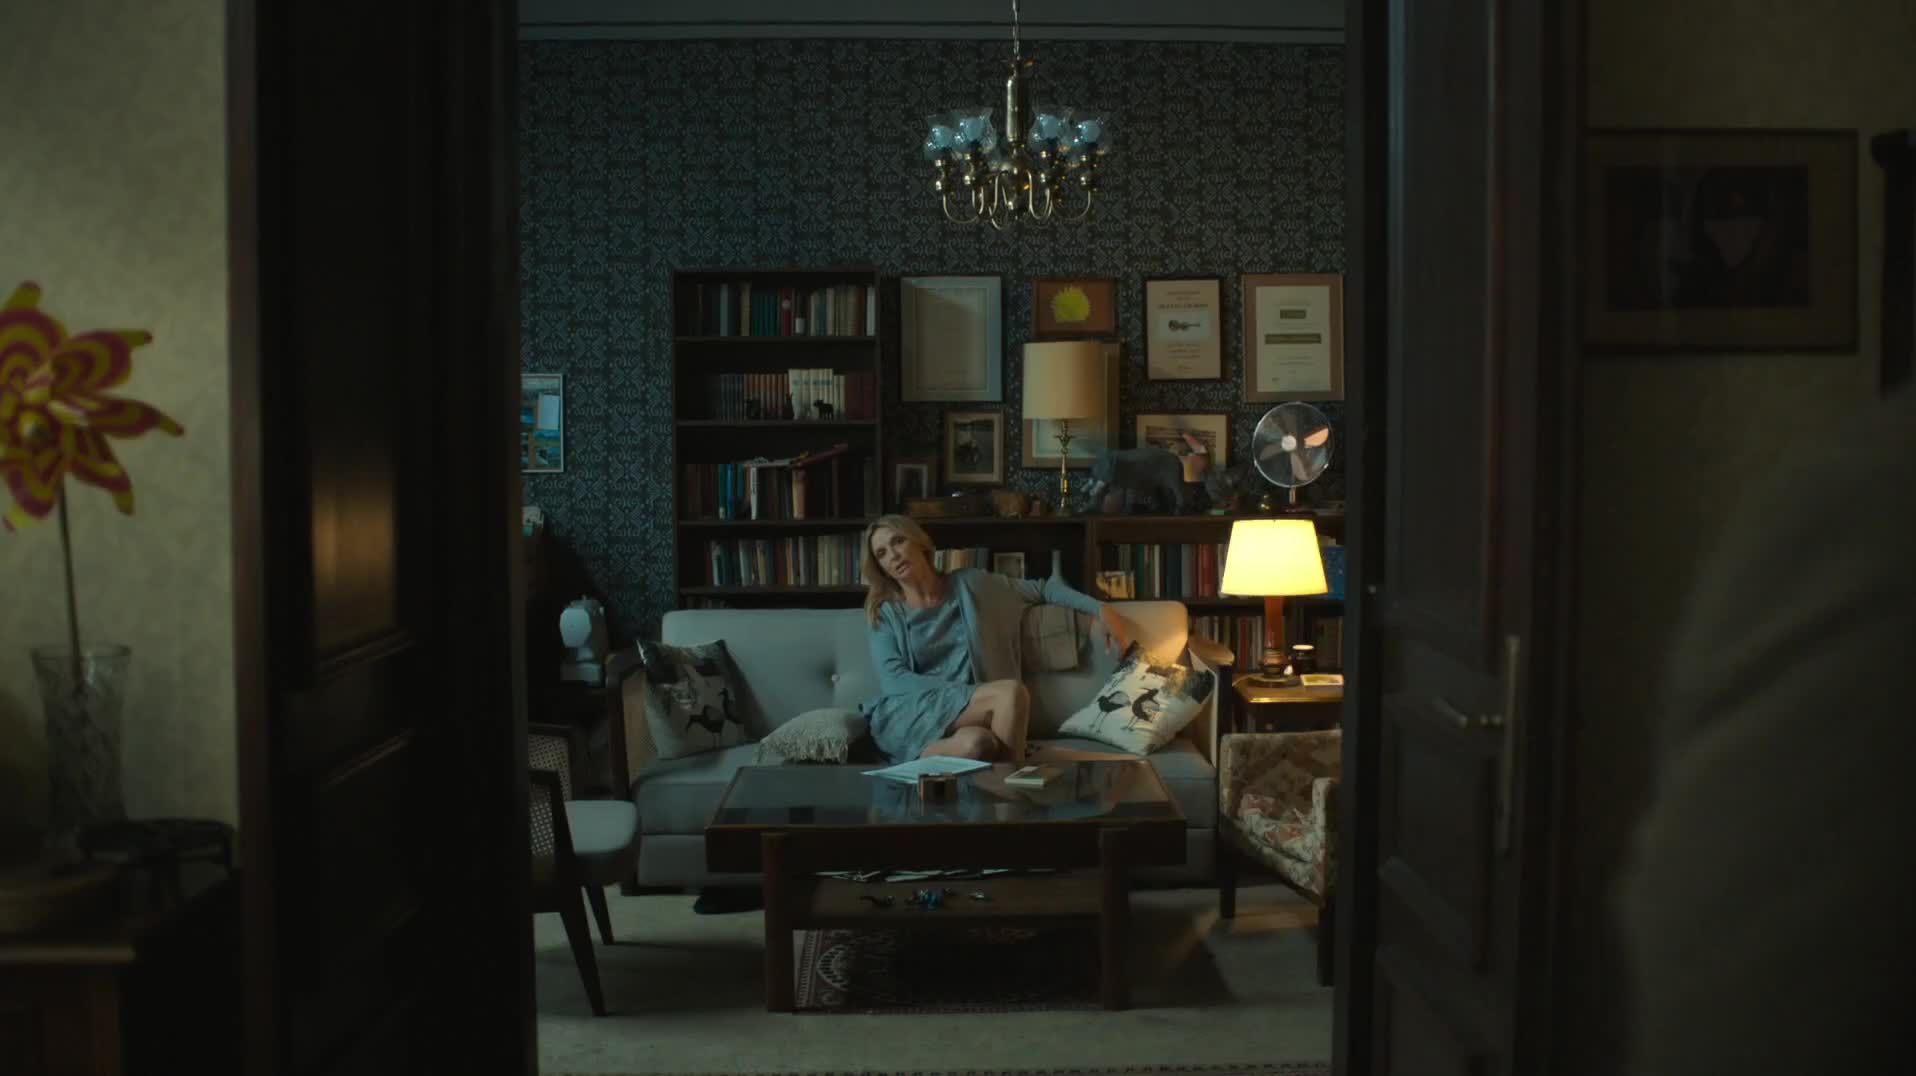 Chlap na stridacku  2020  NOVINKA HD 1080p  Komedie Film CZ